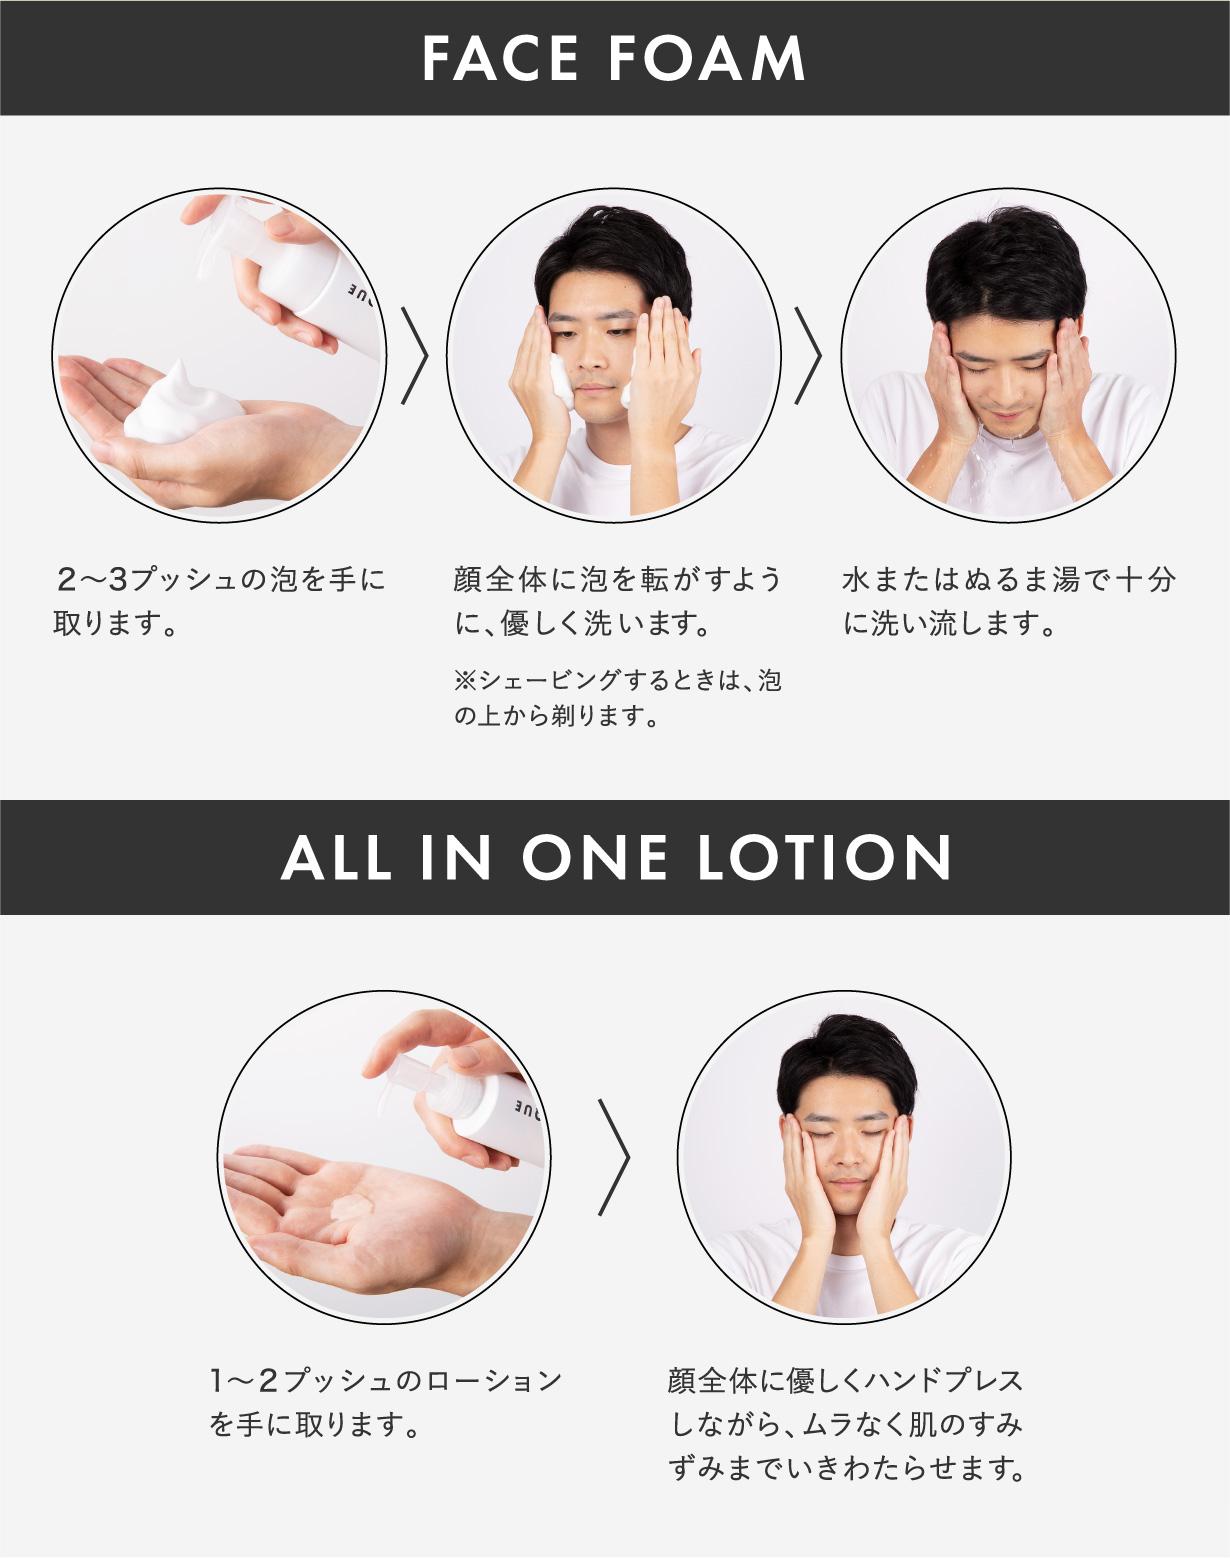 AMBiQUE(アンビーク)2ステップスキンケアセット(洗顔料+保湿化粧水)